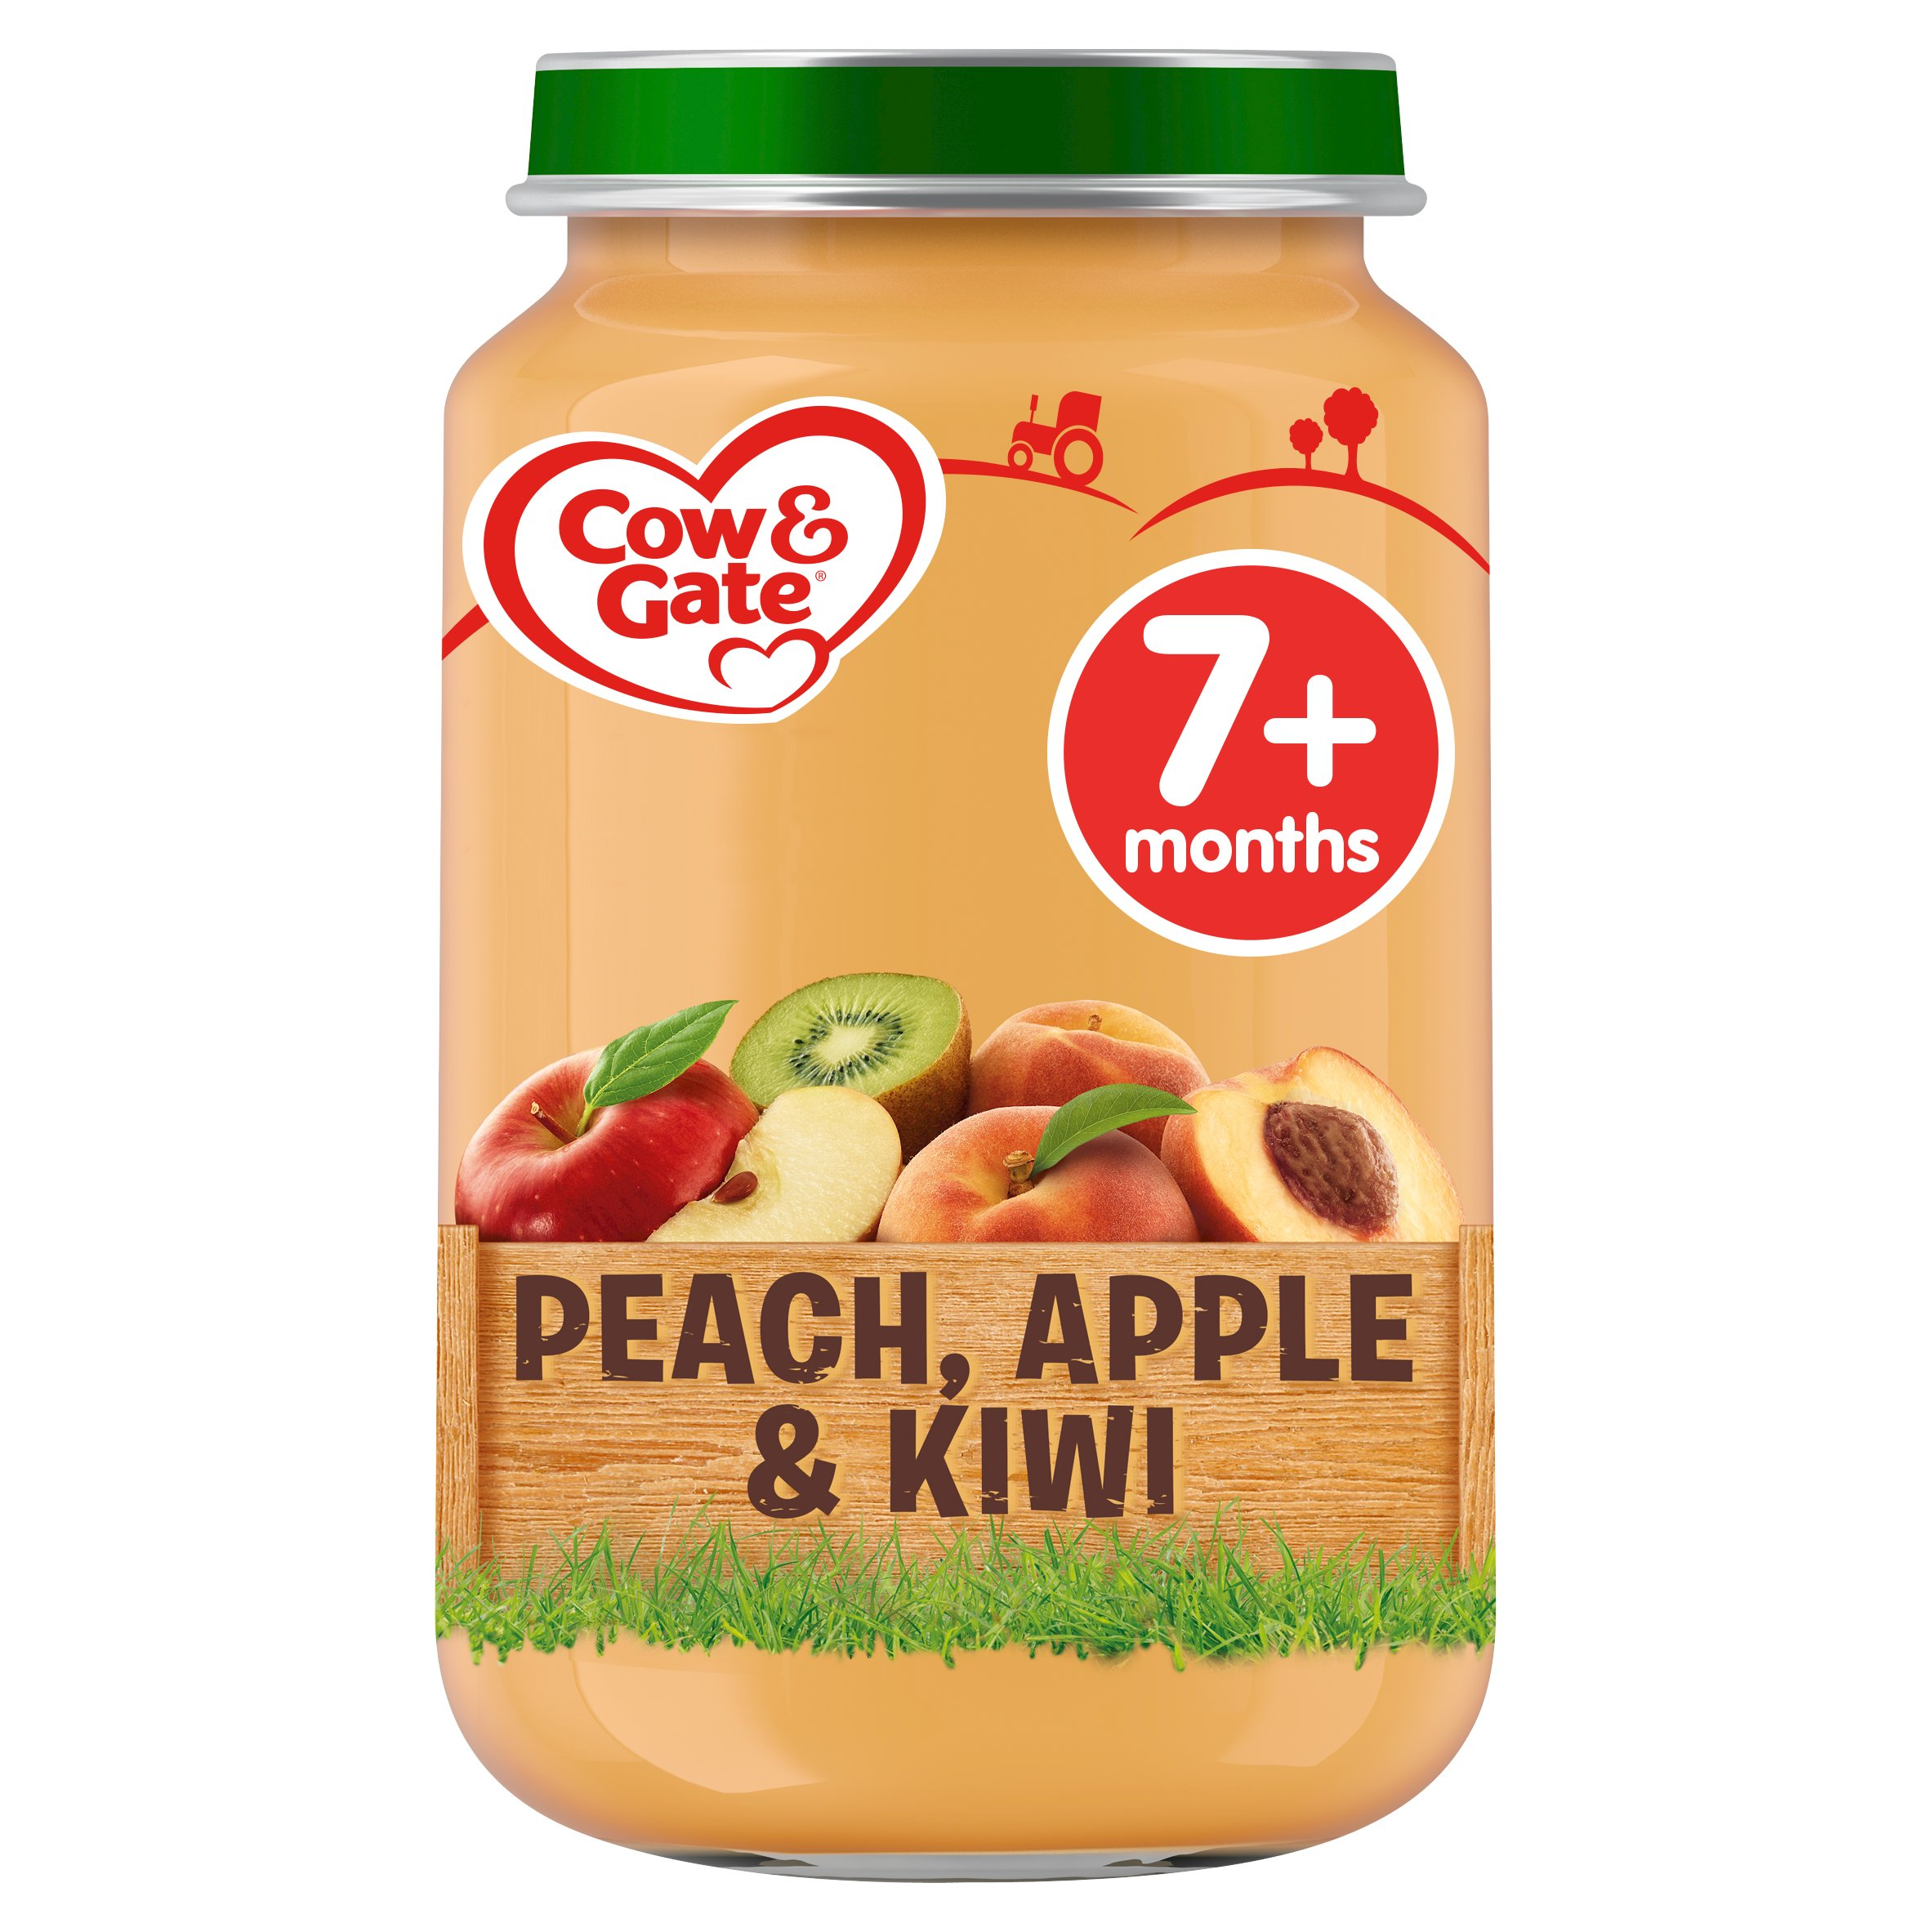 Cow & Gate Stage 2 Peach Apple & Kiwi 200G